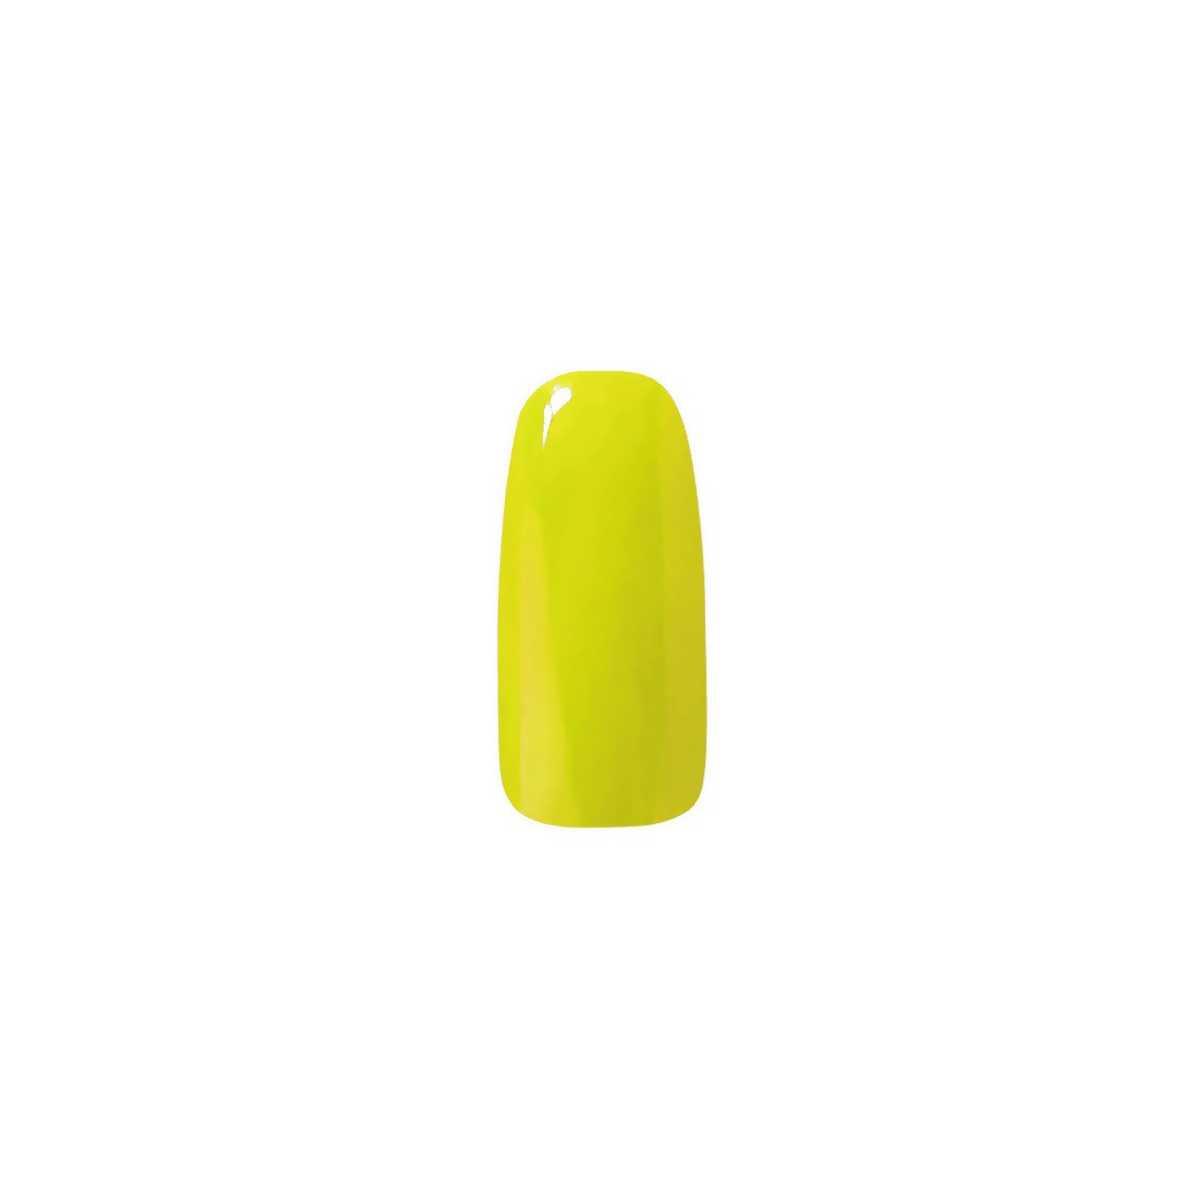 https://www.kit-manucure.com/1967-thickbox_default/gel-uv-jaune-papillon-5-ml.jpg